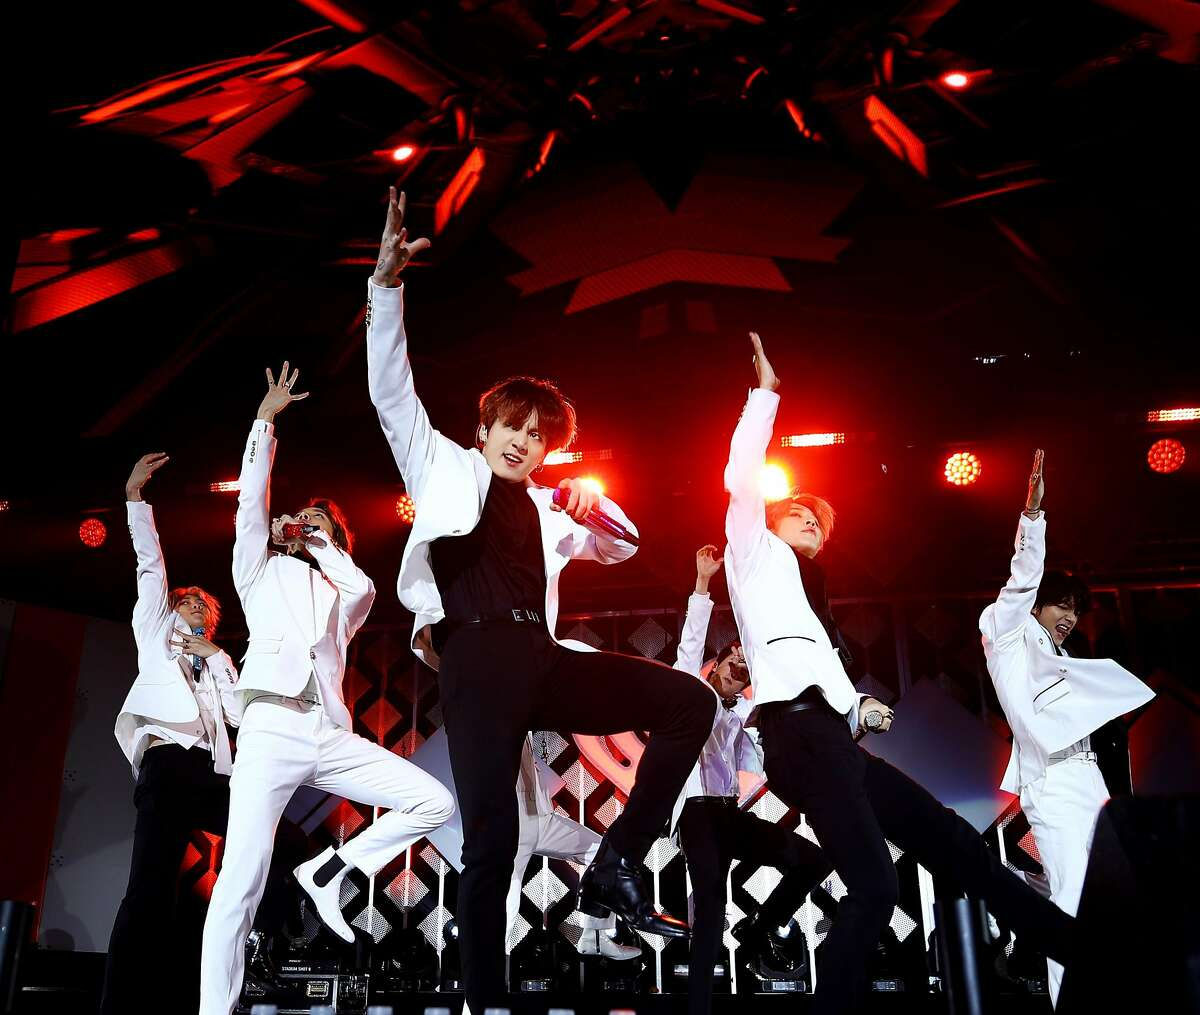 Bangtan Sonyeondan (PUNG-tahn SOH-nyun-dahn) The full name of South Korean K-Pop band 'BTS', which translates as